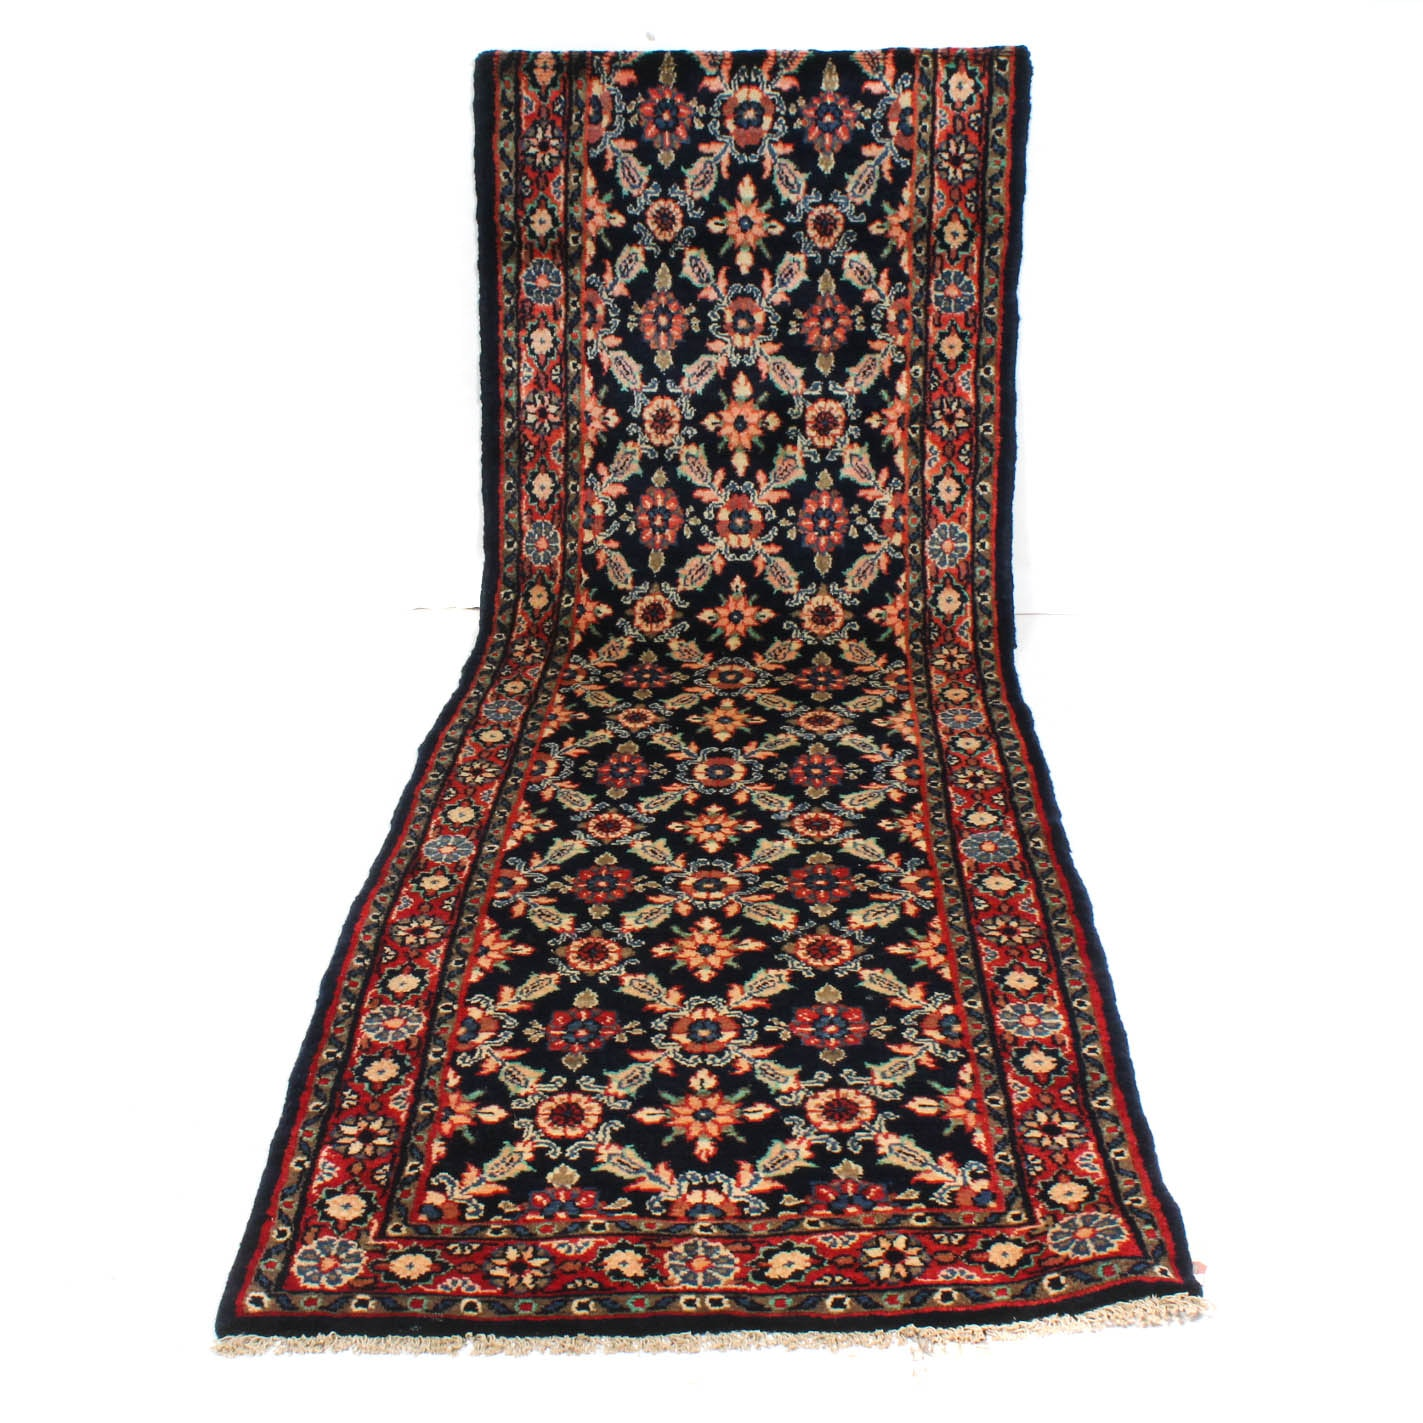 Vintage Hand-Knotted Persian Hamadan Runner